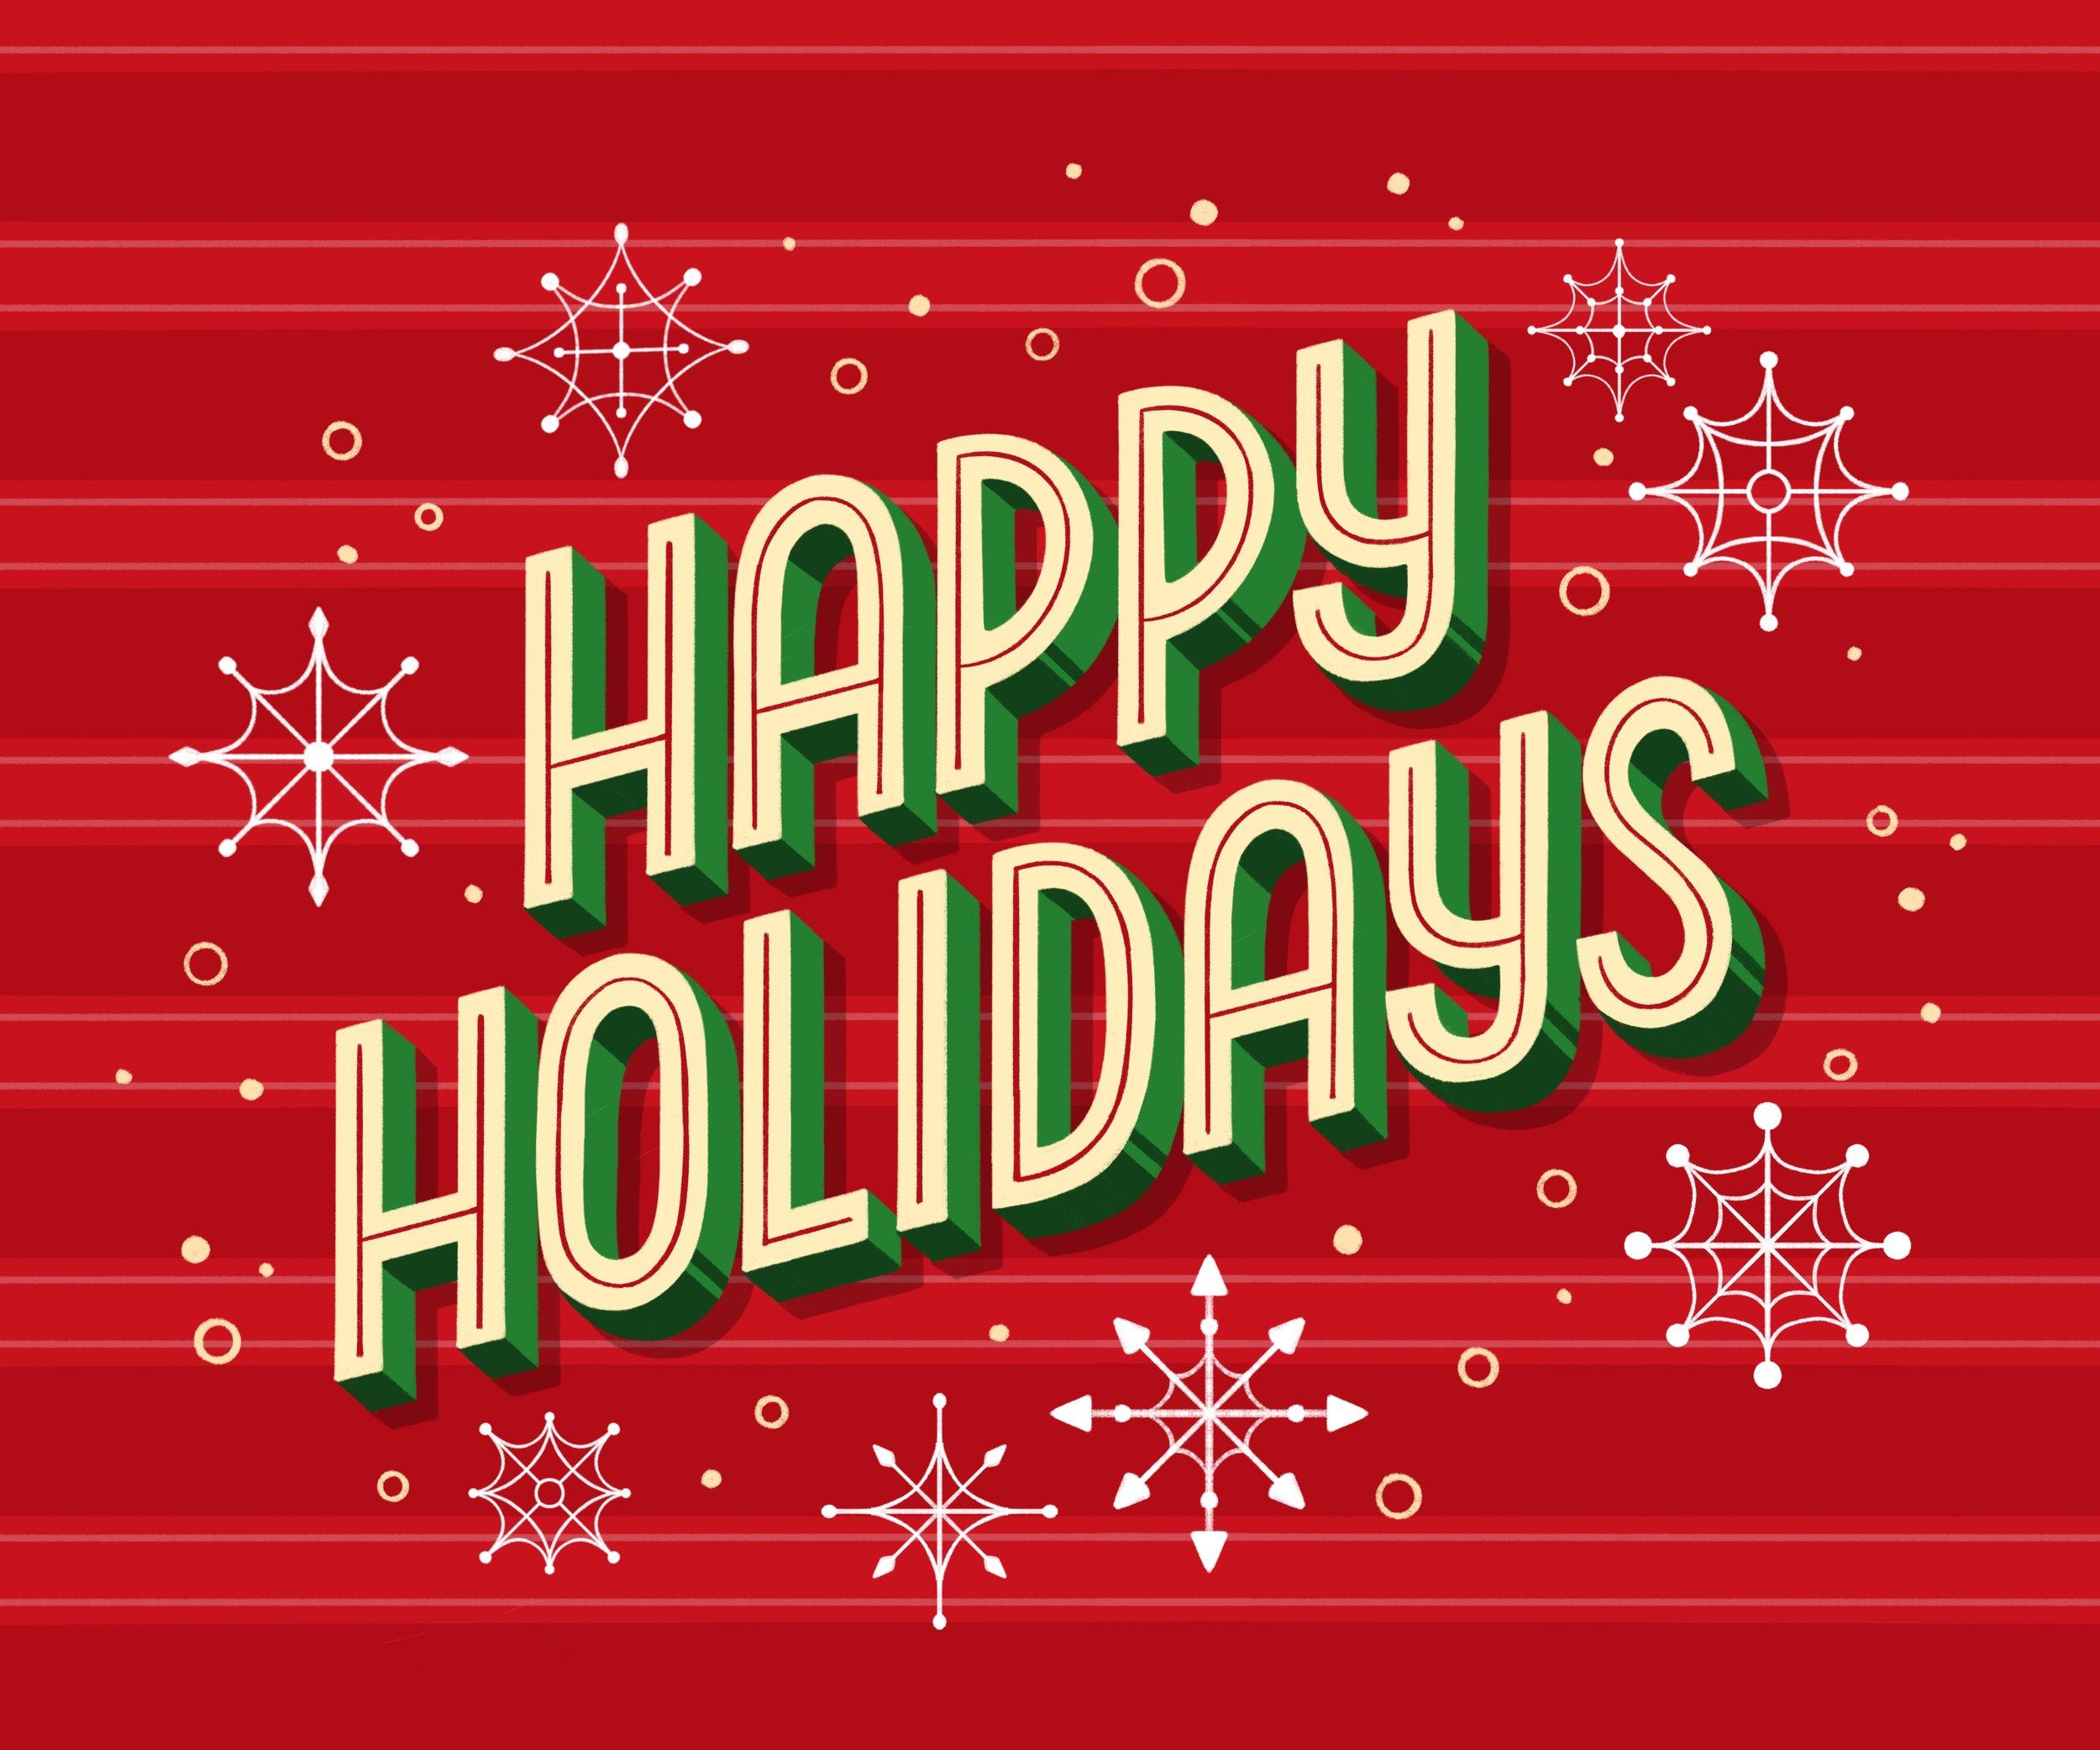 KJ-Christmas_HappyHolidaysStripesandSnowflakes.jpg